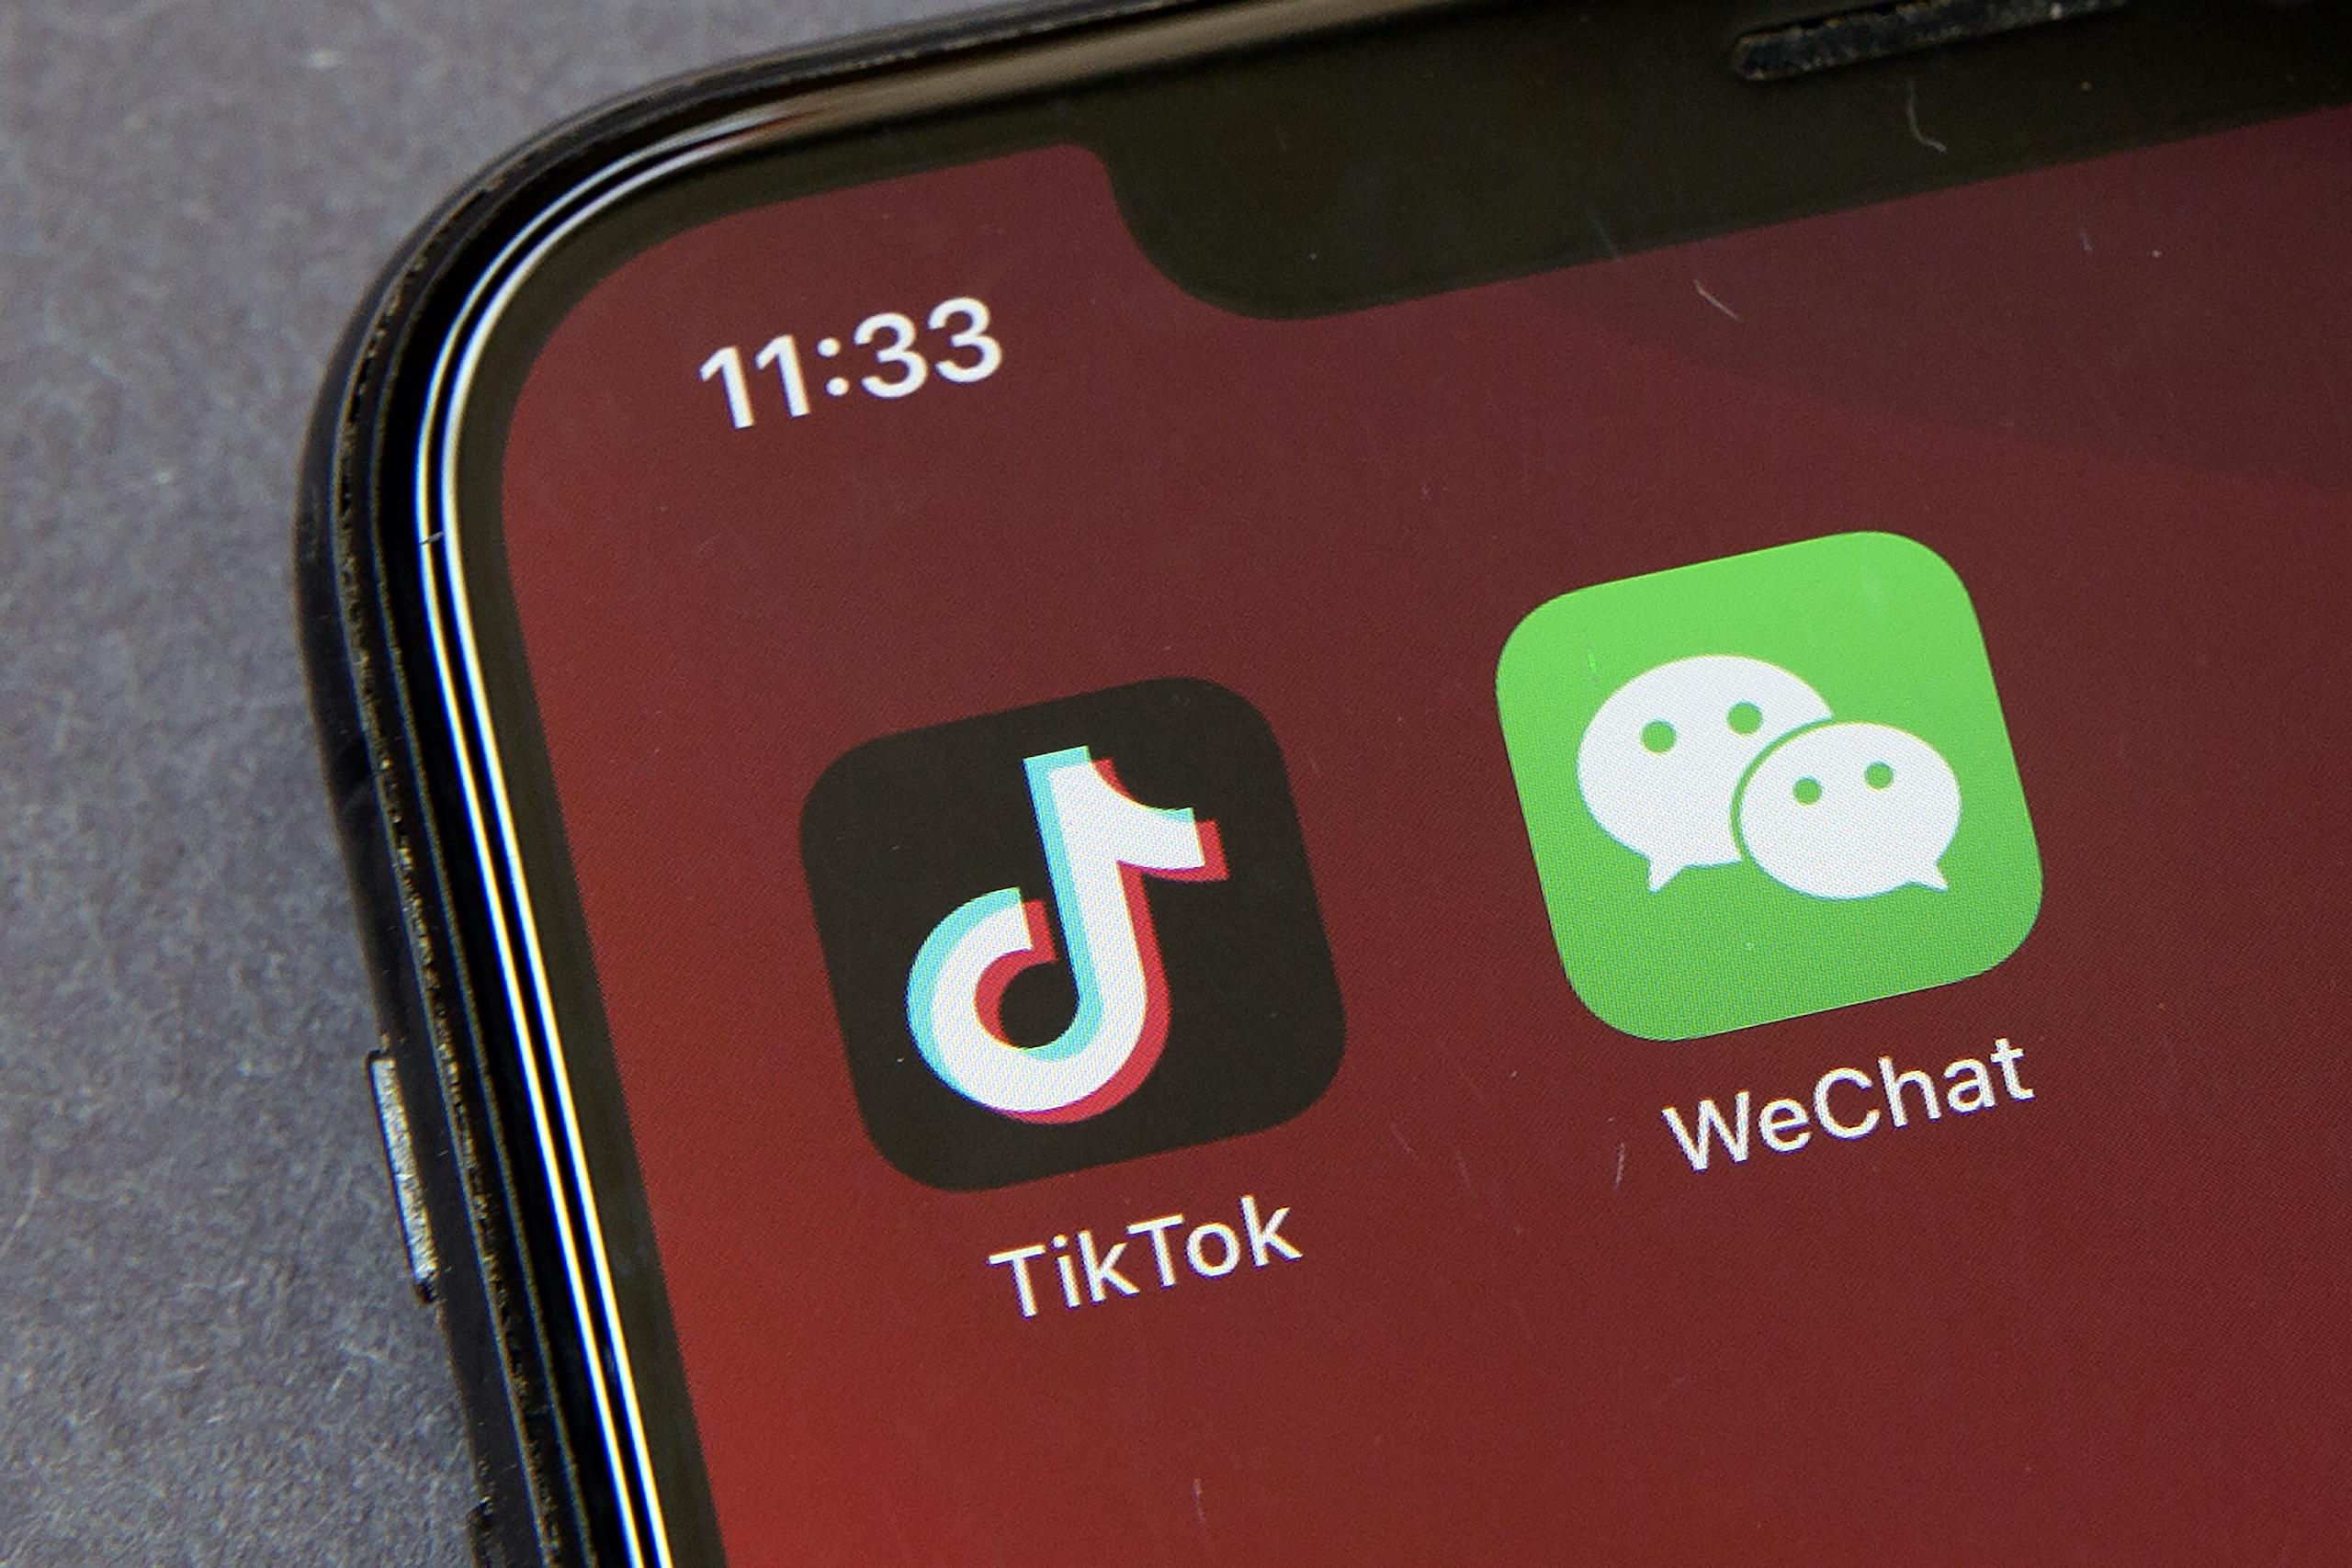 TikTok and WeChat apps